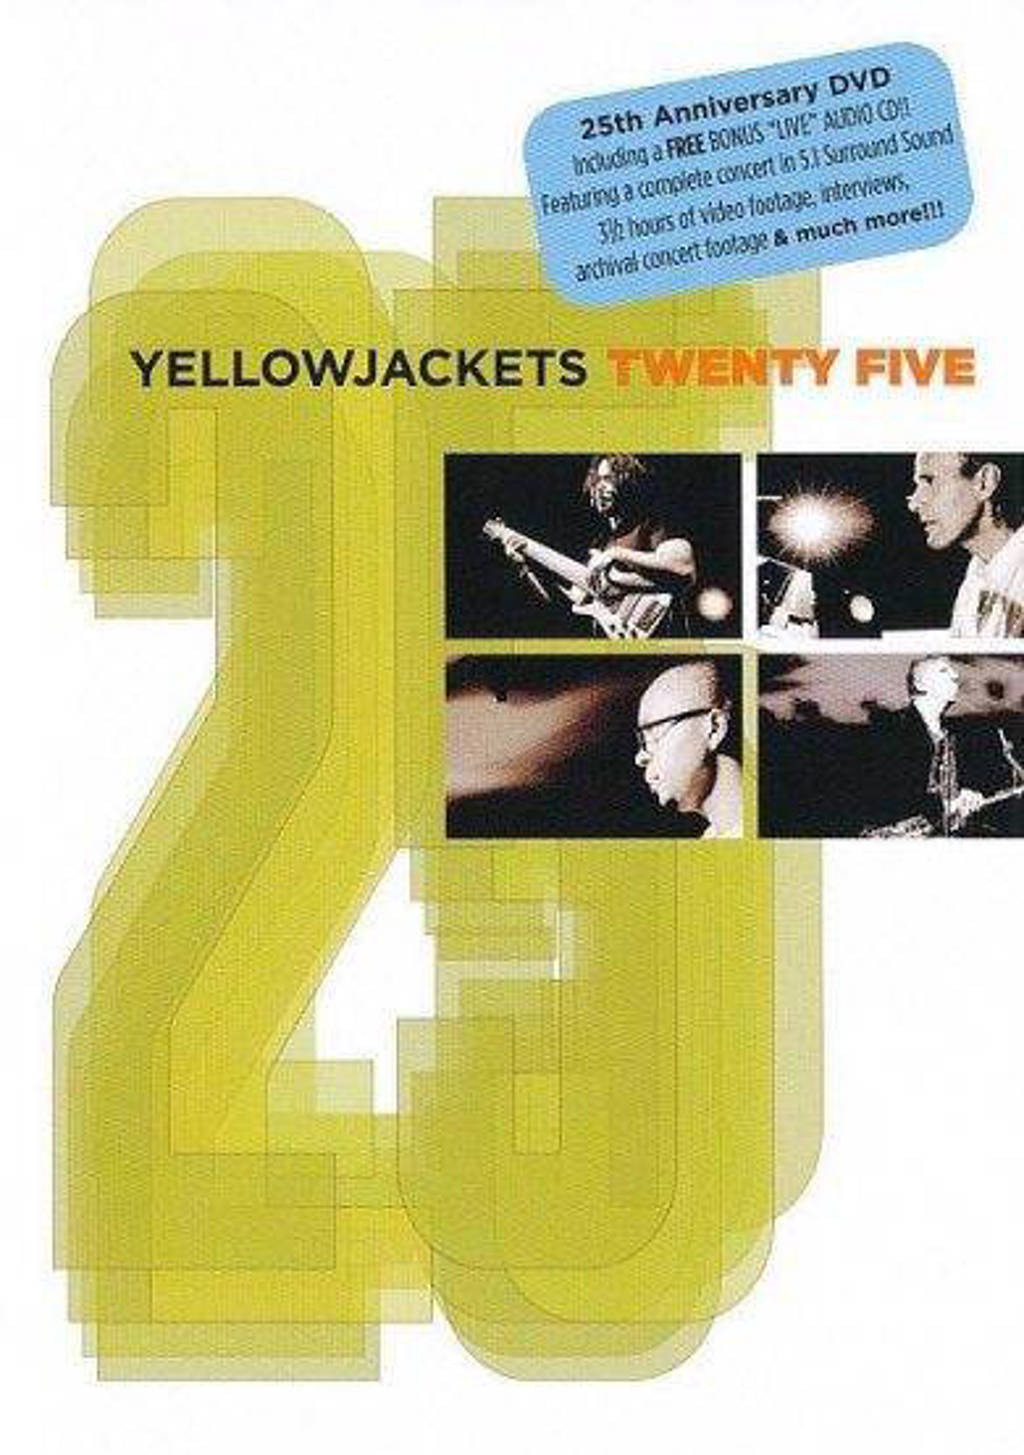 Yellowjackets - Twenty Five (DVD)